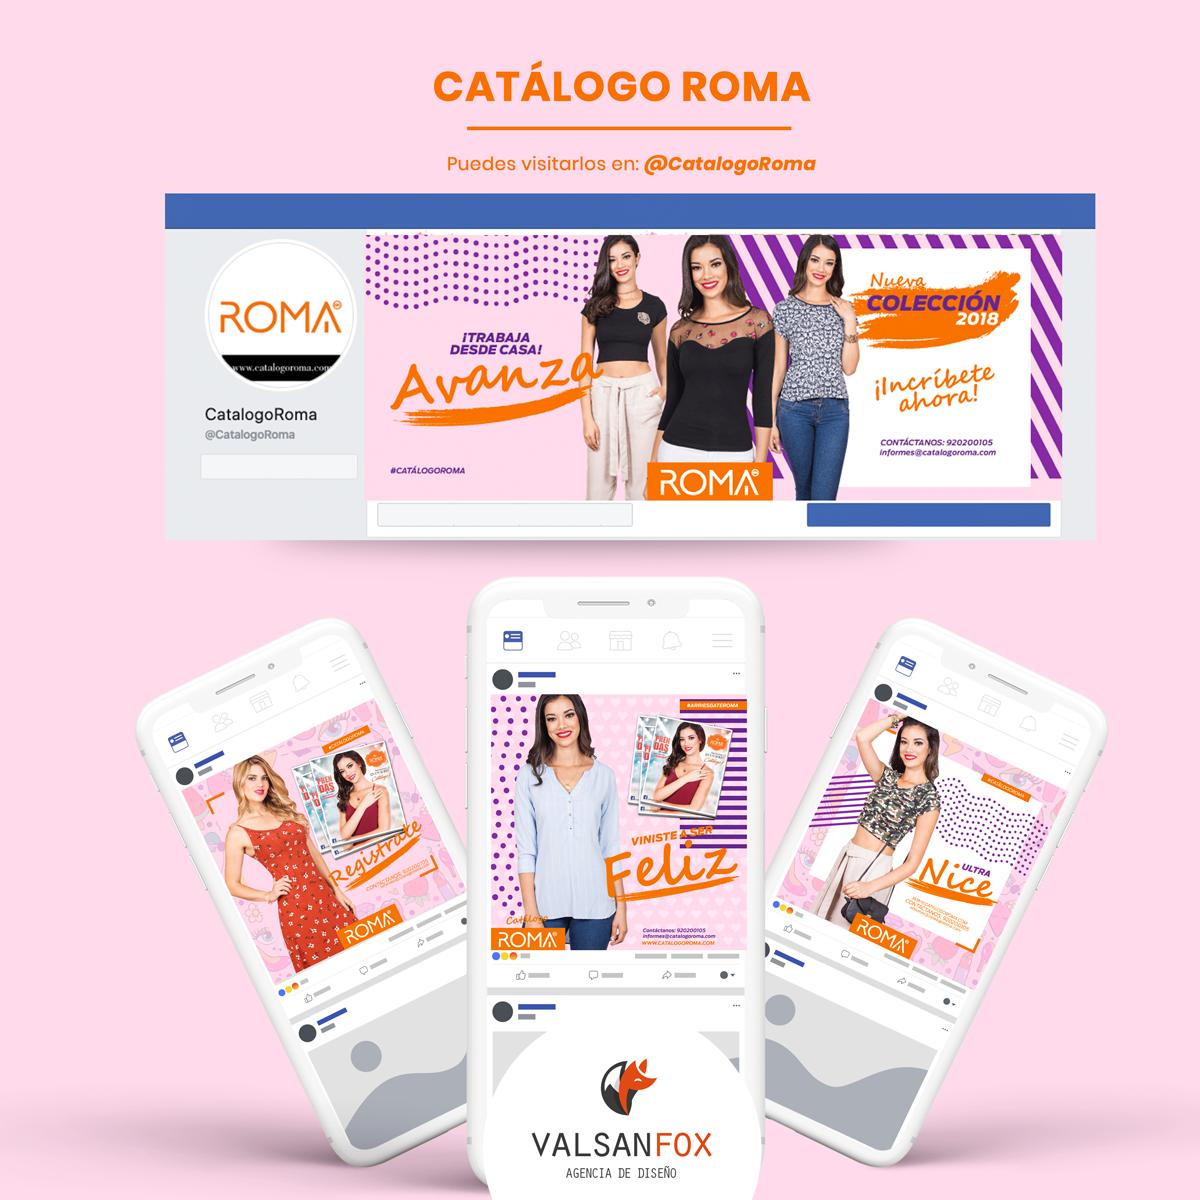 roma catalogo-valsanfox-redes sociales